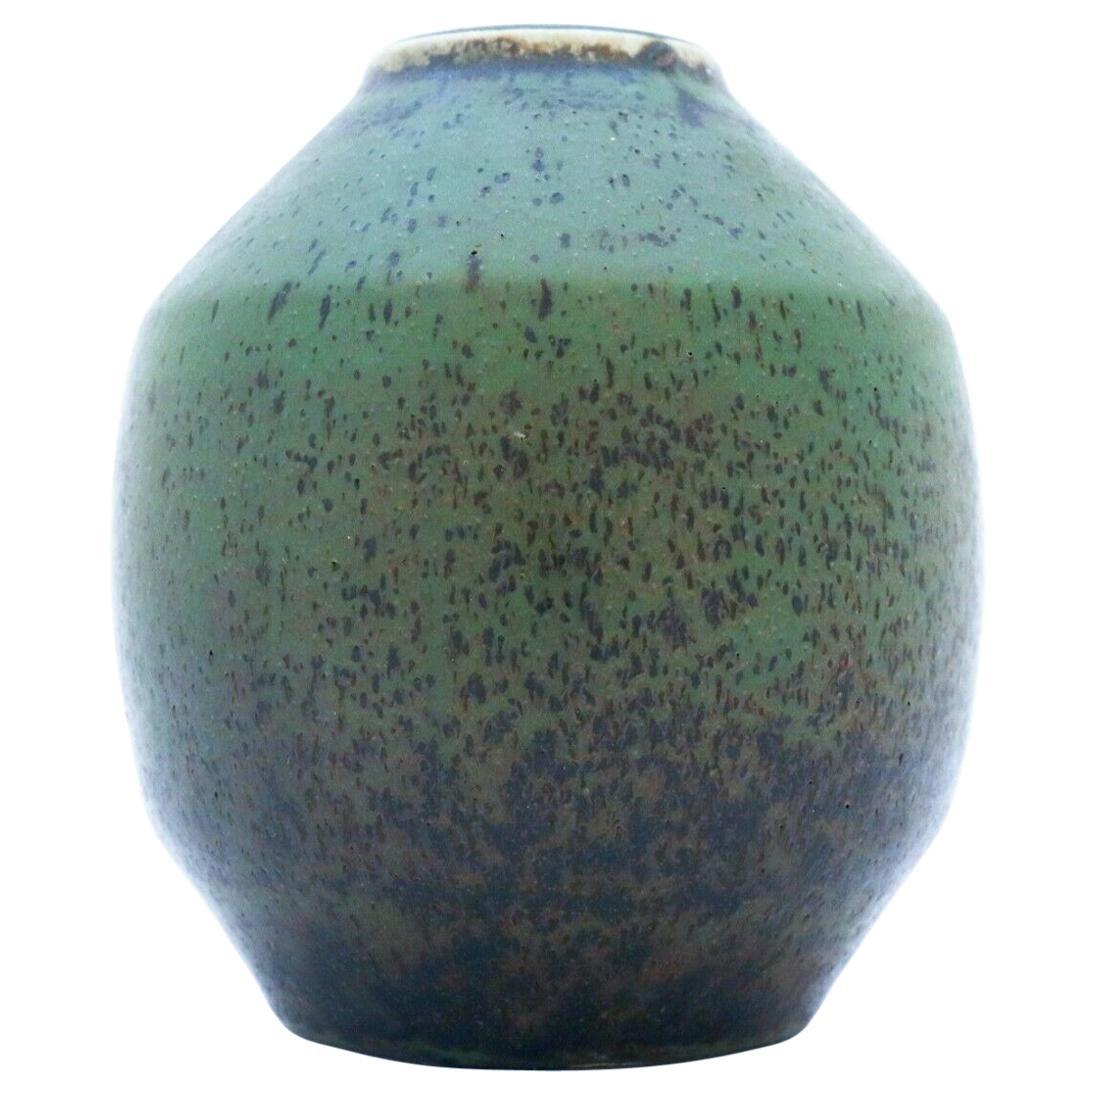 Carl-Harry Stålhane, Rörstrand, Green Unique Stoneware Vase, 1960